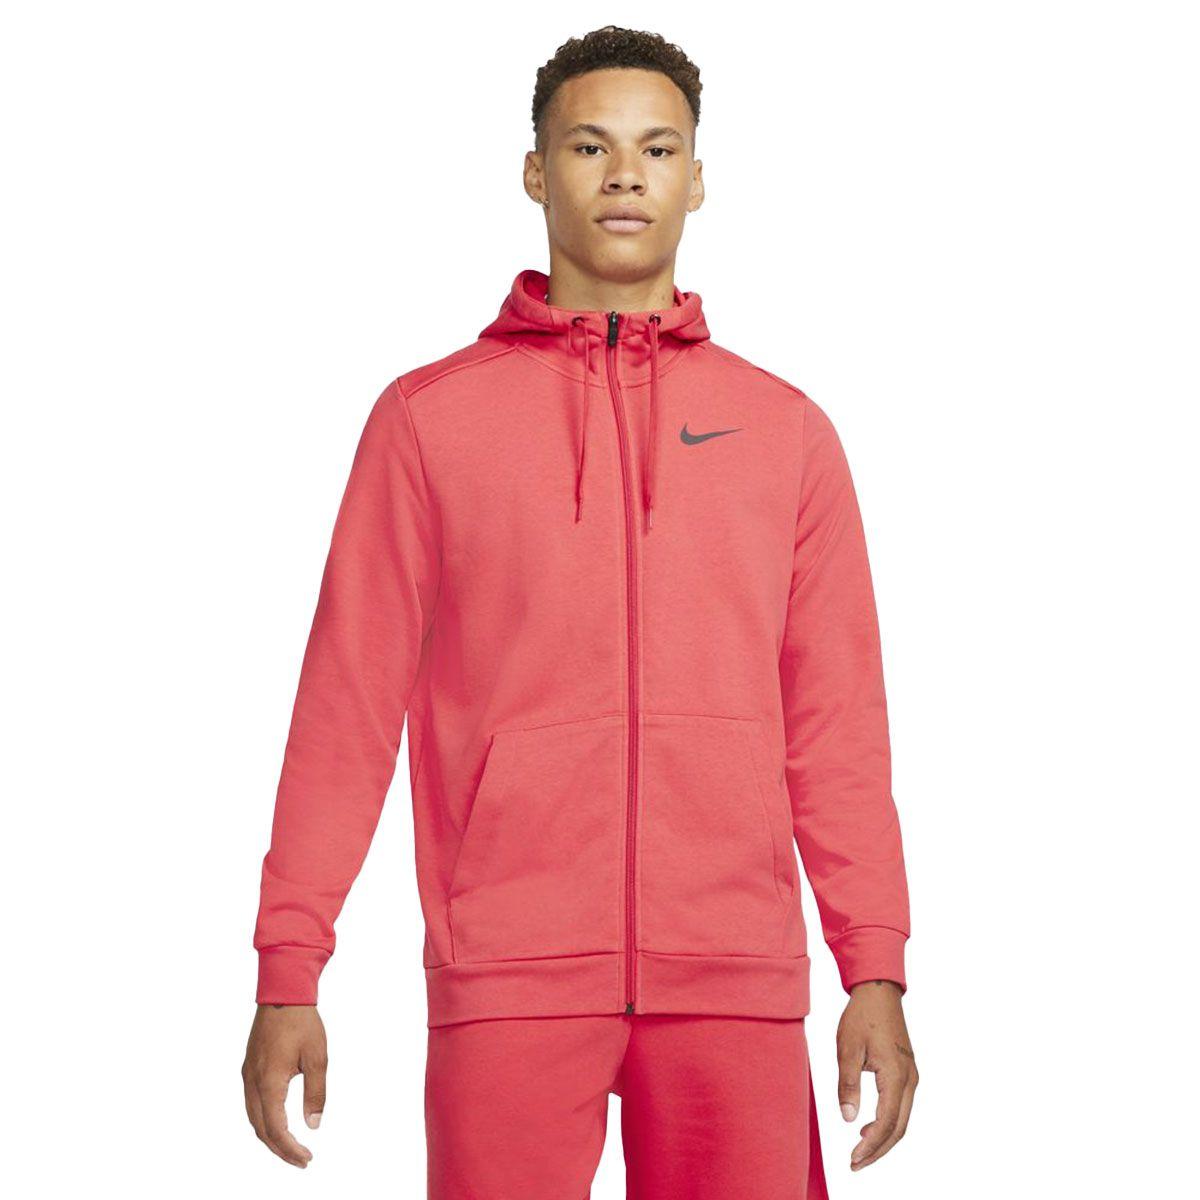 Nike Felpa Dri-FIT Uomo Rosa